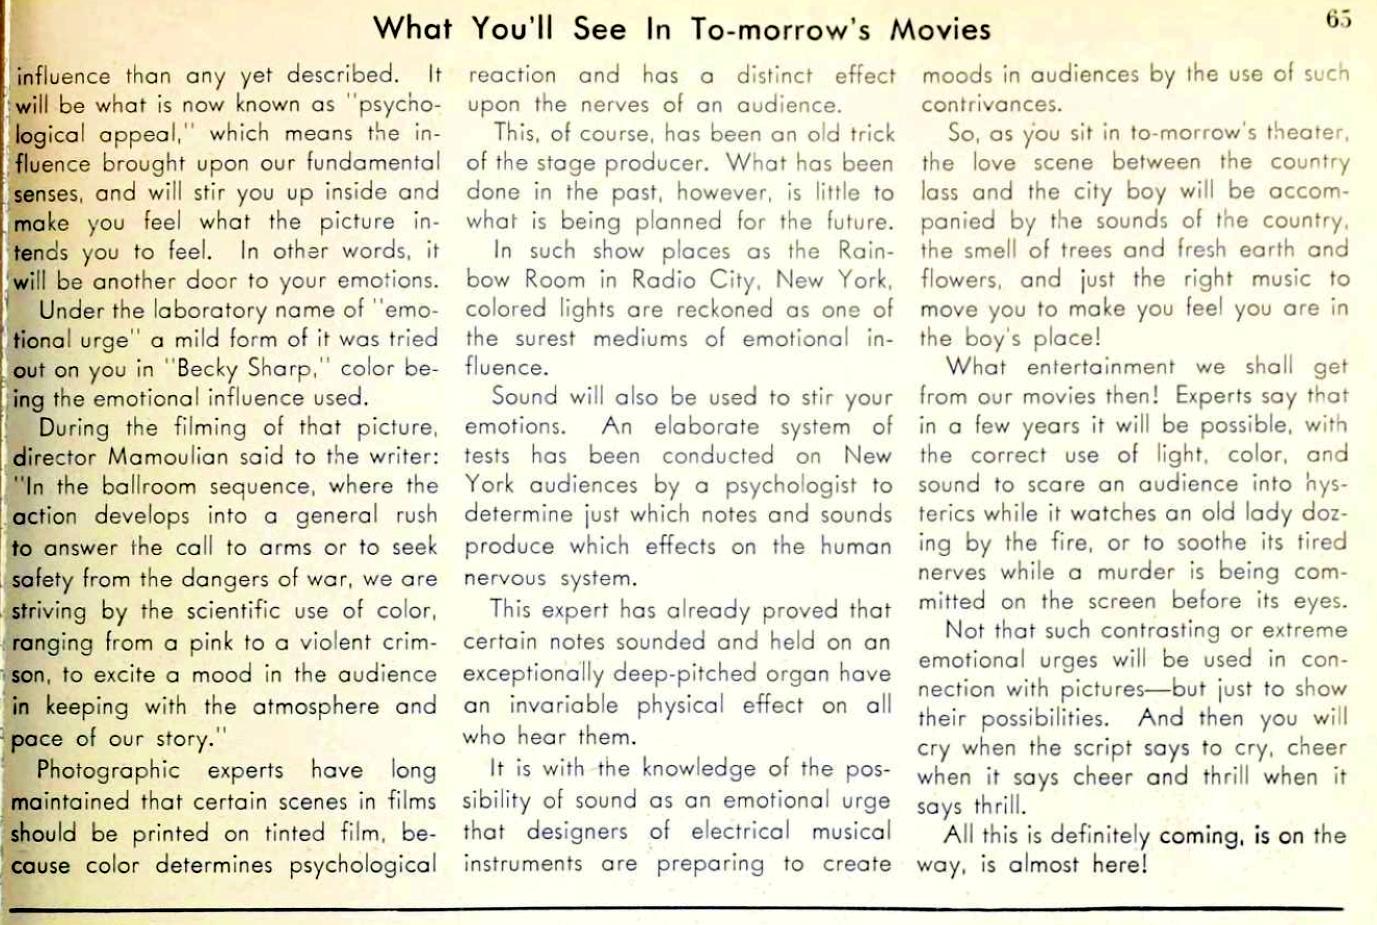 picture play february 1936da